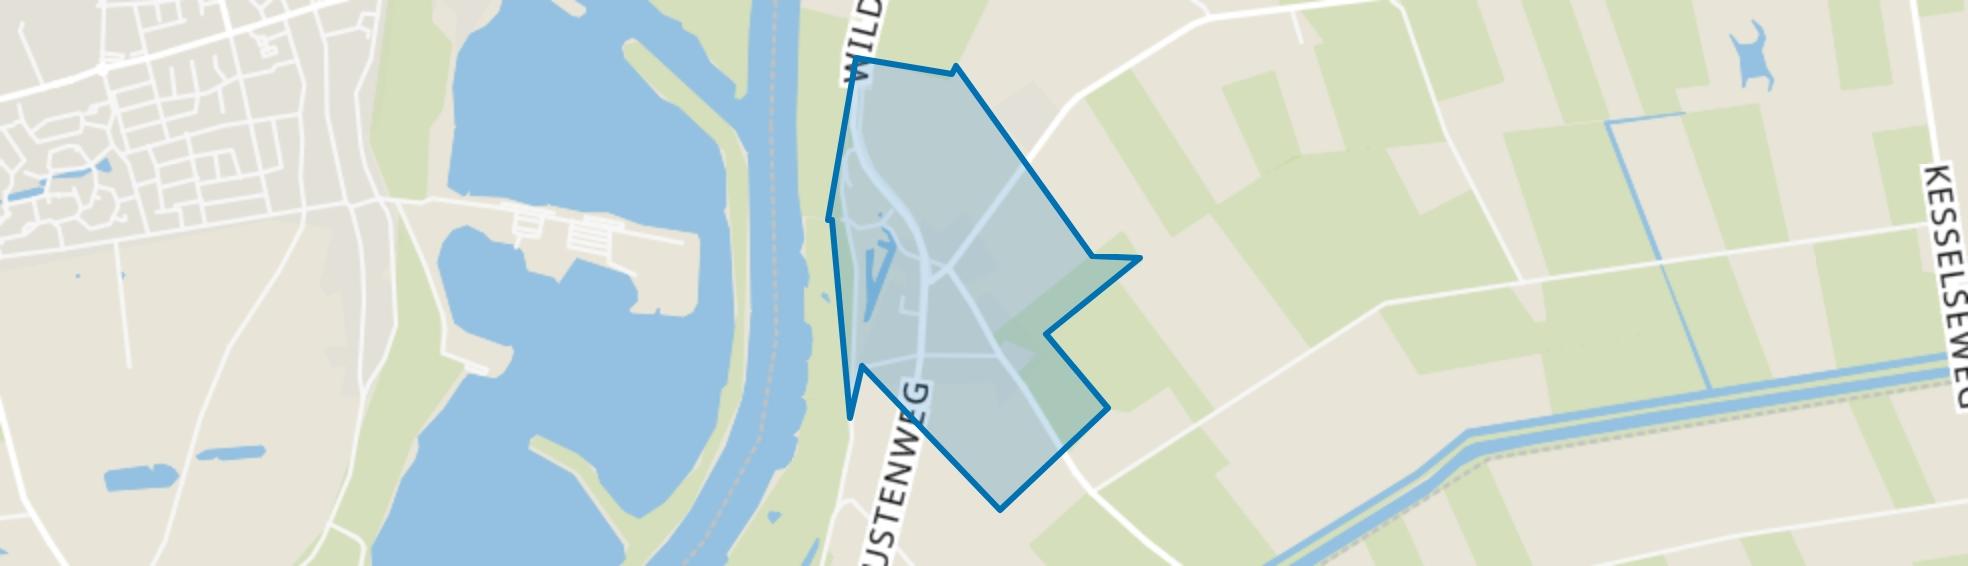 't Wild, Maren-Kessel map